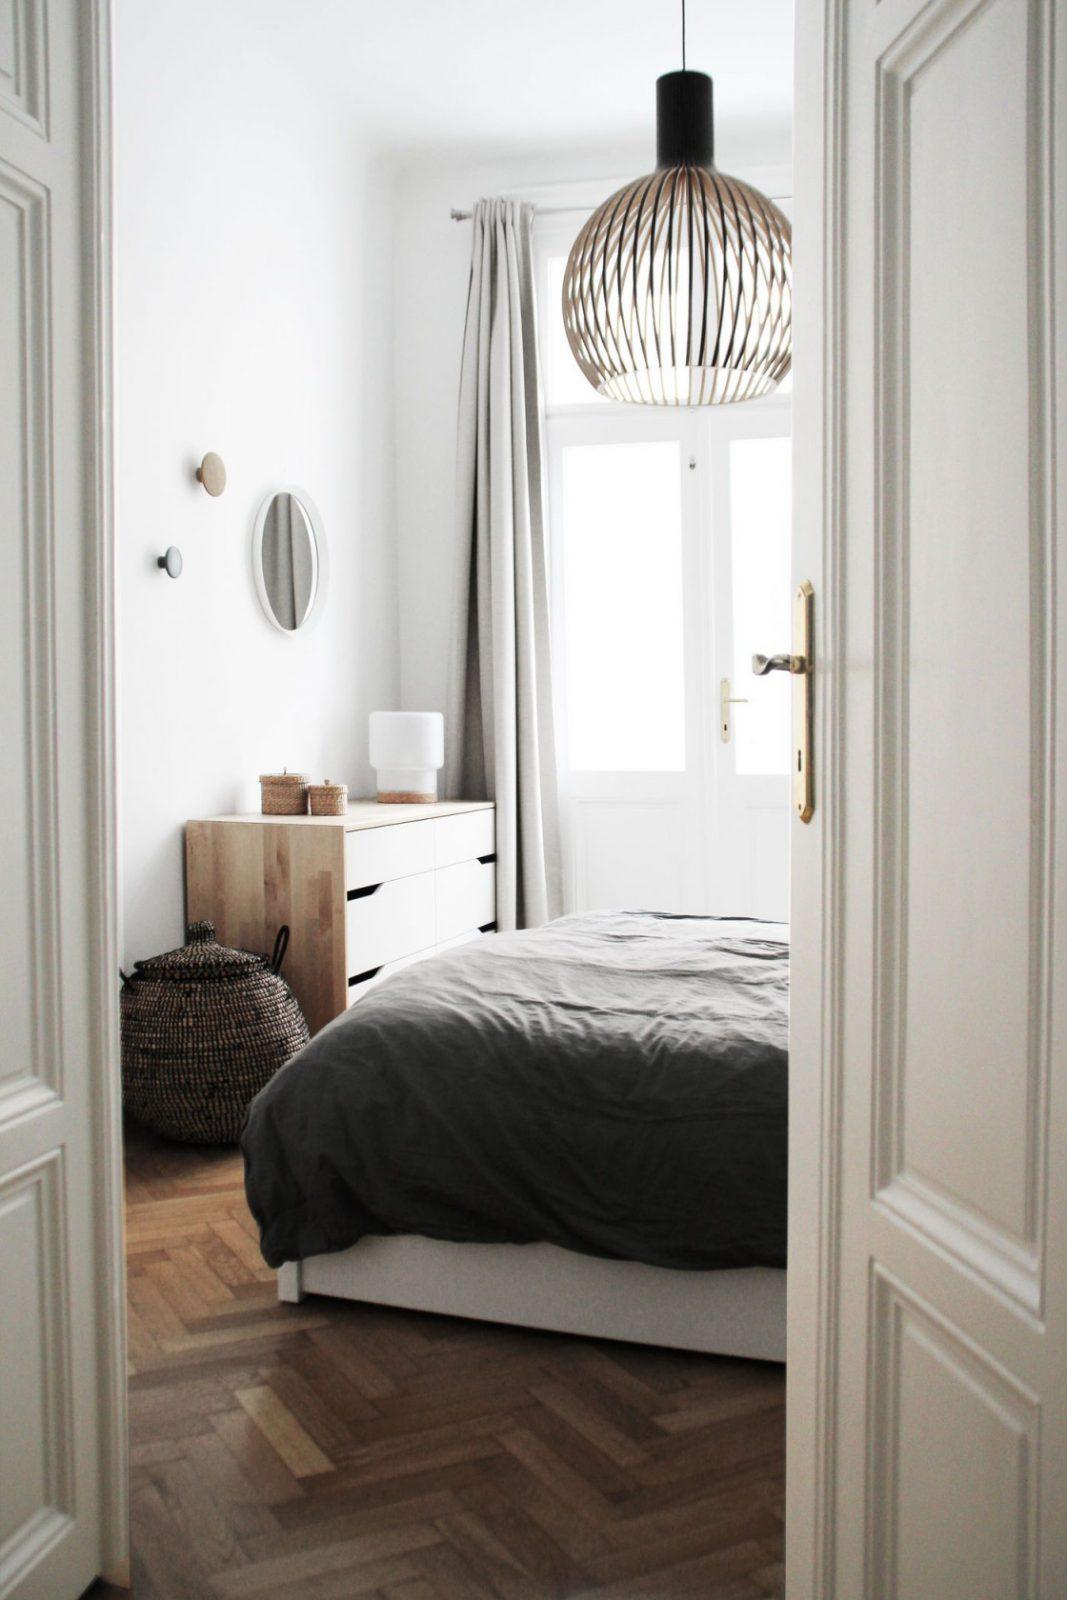 Gardinen Schlafzimmer Ideen  Bedroom Ideas  Bedroom Ideas von Vorhänge Schlafzimmer Ideen Photo